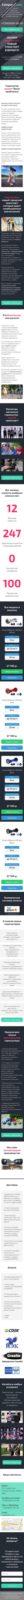 Скриншот лендинга Гироскутер 002 - моб